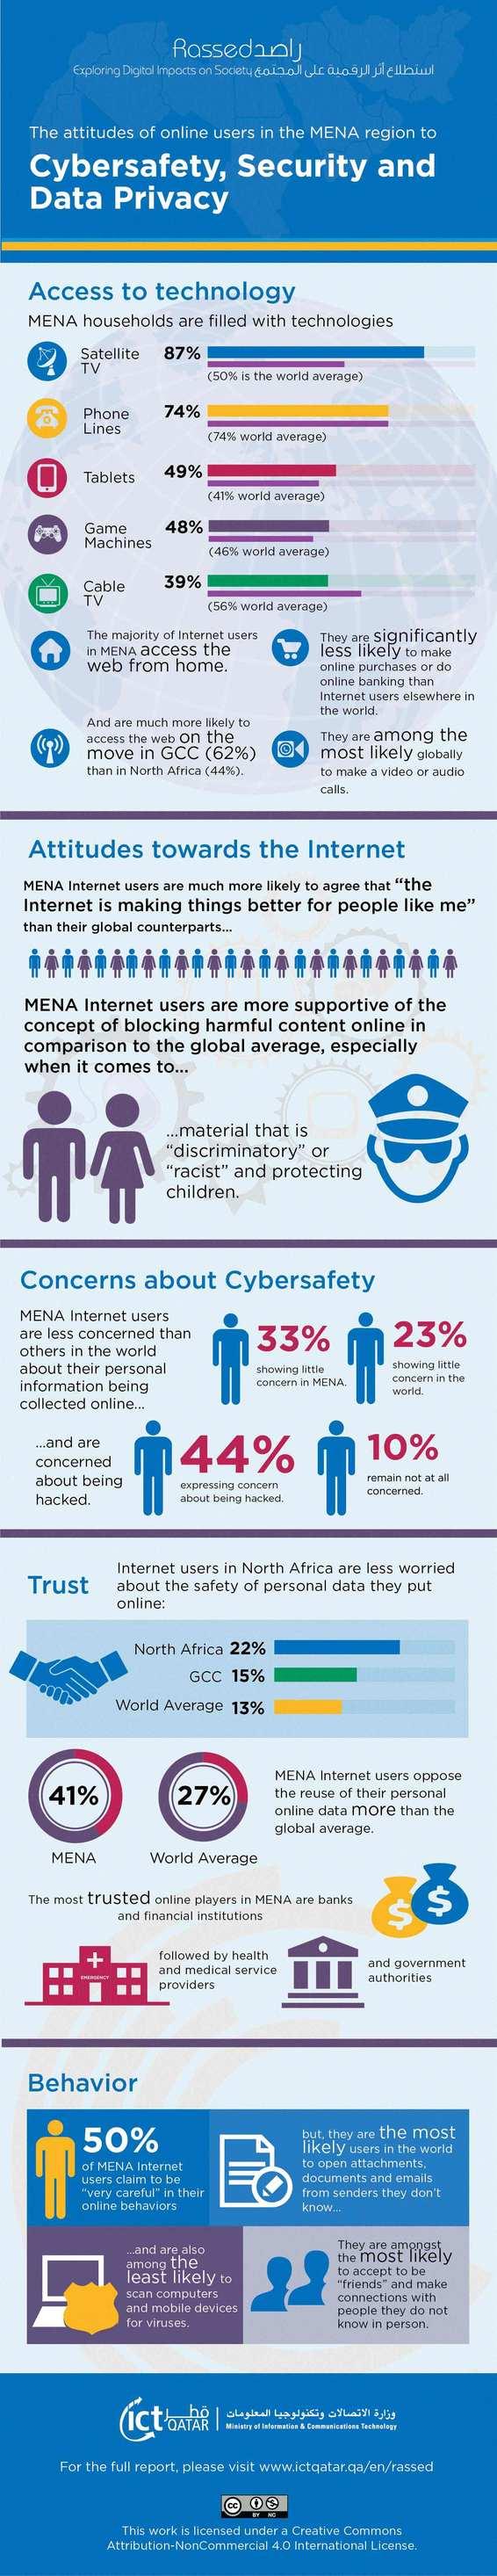 2014-10-19-Infographic_cs_report.jpg